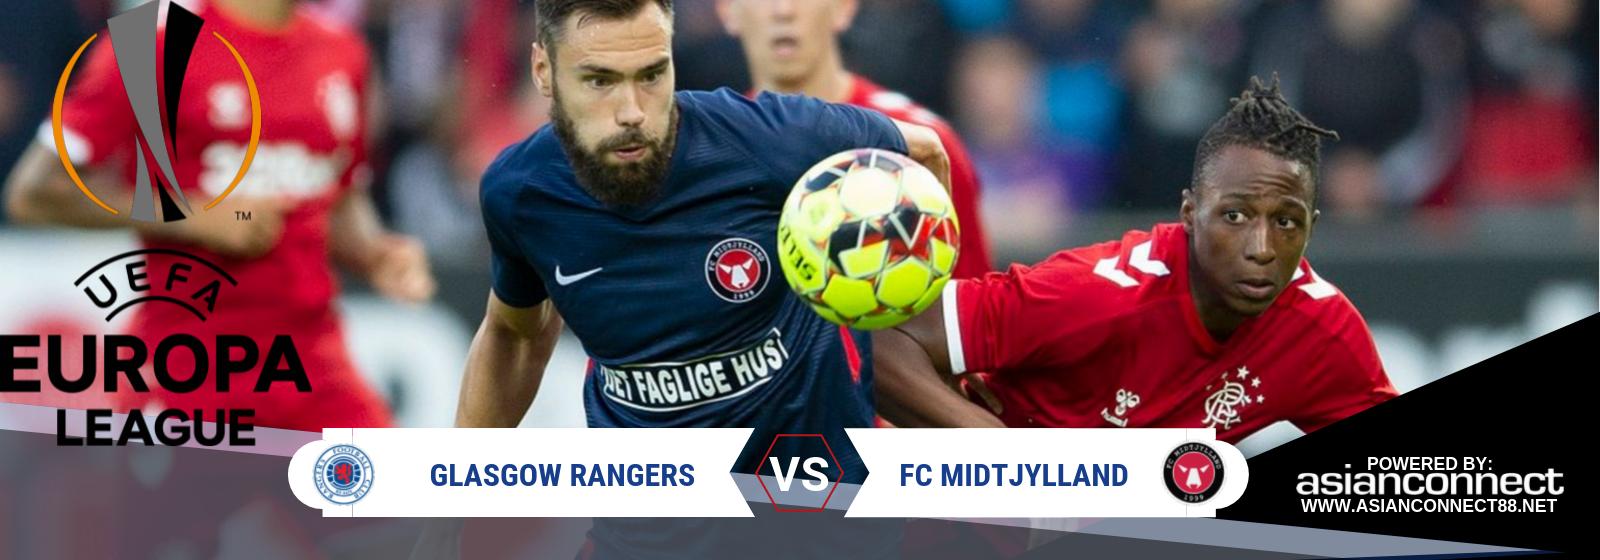 UEL Glasgow Rangers Vs FC Midtjylland Asian Connect